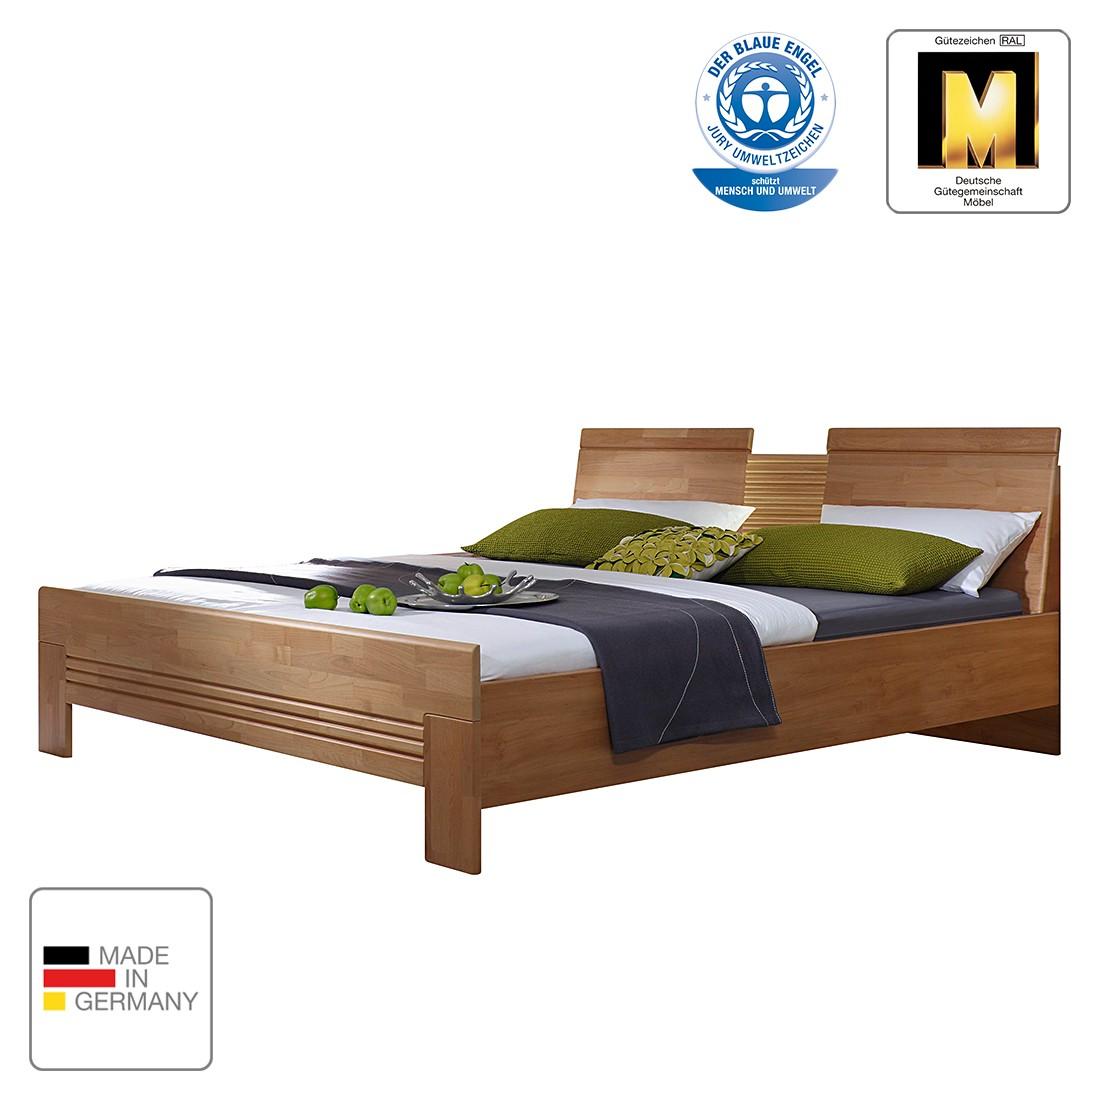 goedkoop Bed Savina 180 x 200cm Els Zonder verlichting Rauch Steffen